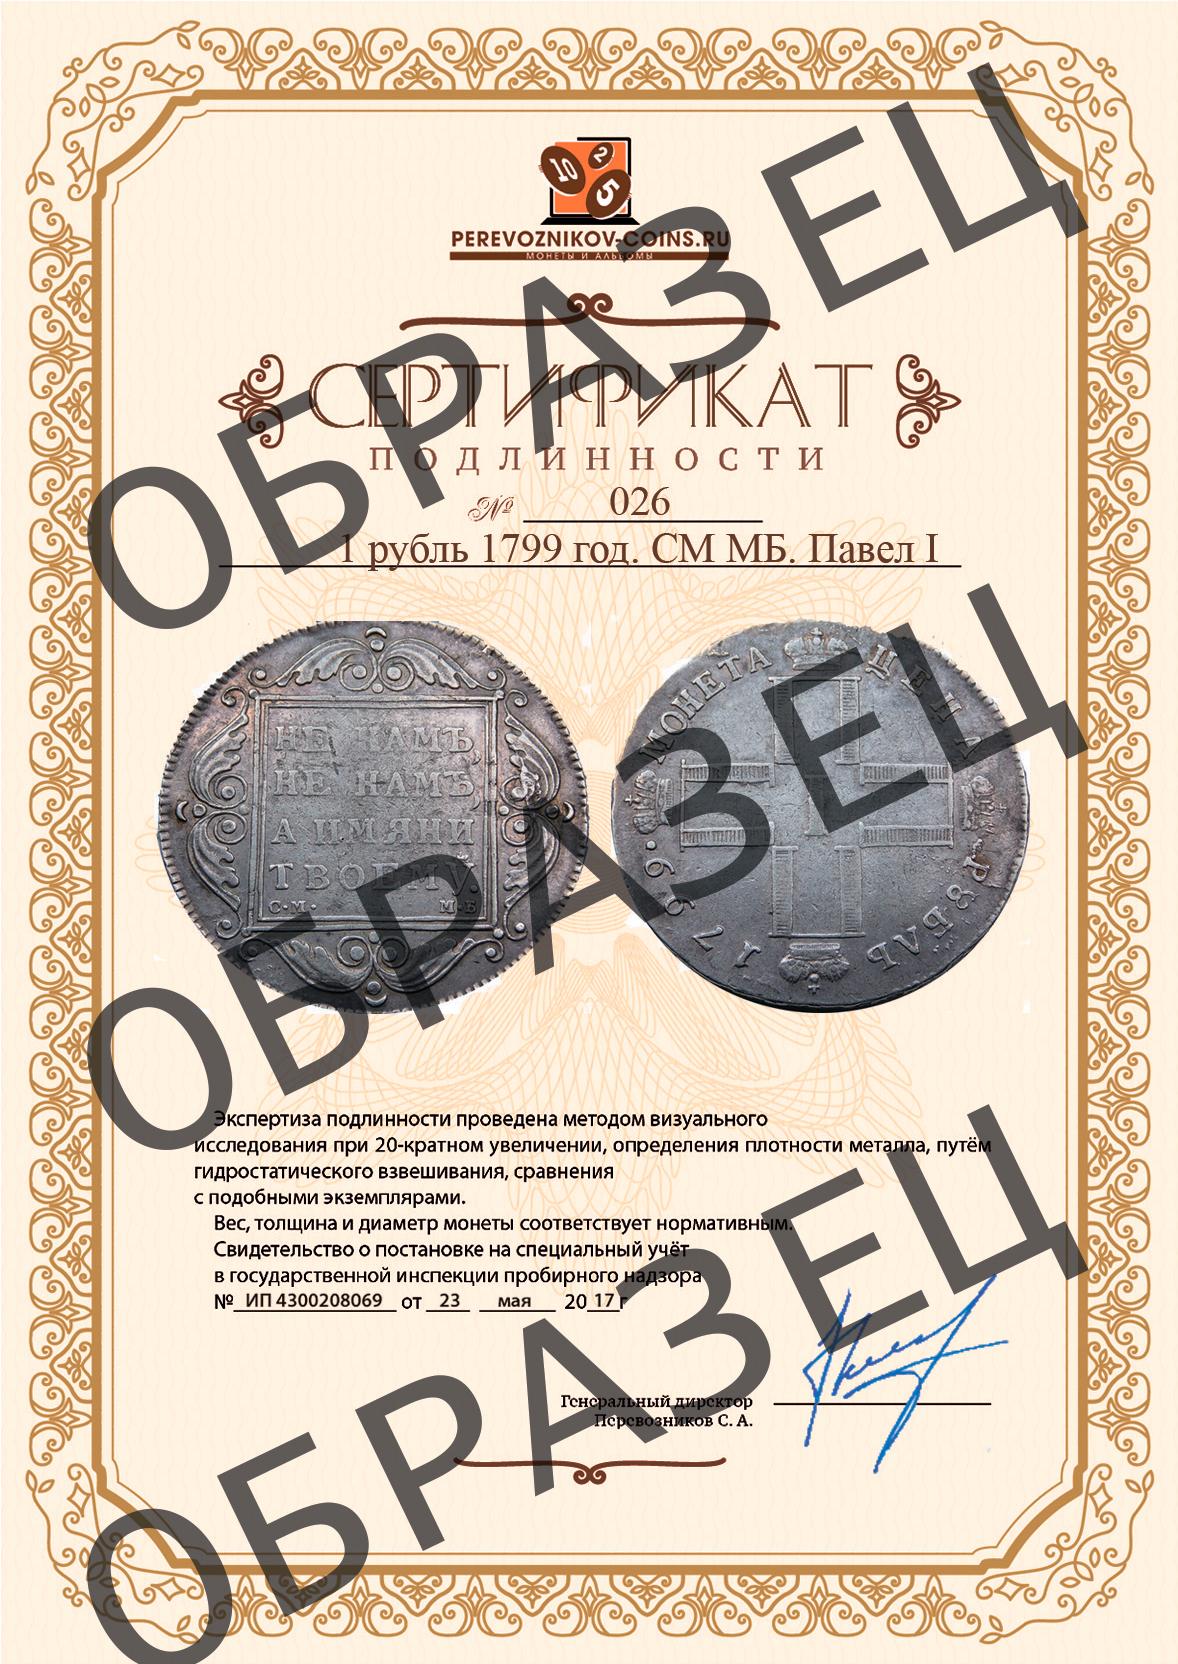 1 рубль 1799 год. СМ МБ. Павел I